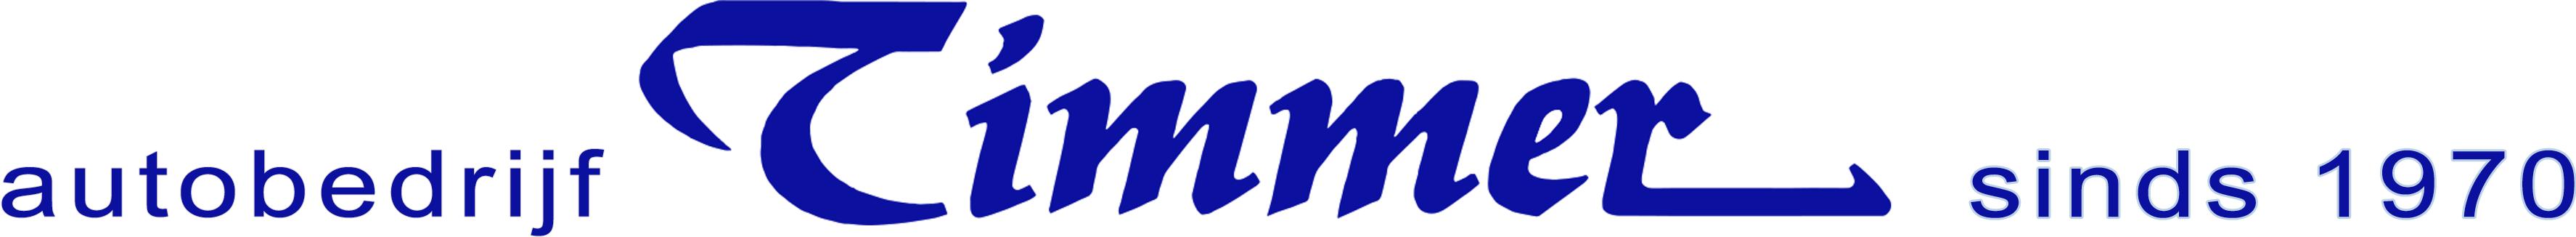 Autobebedrijf Timmer